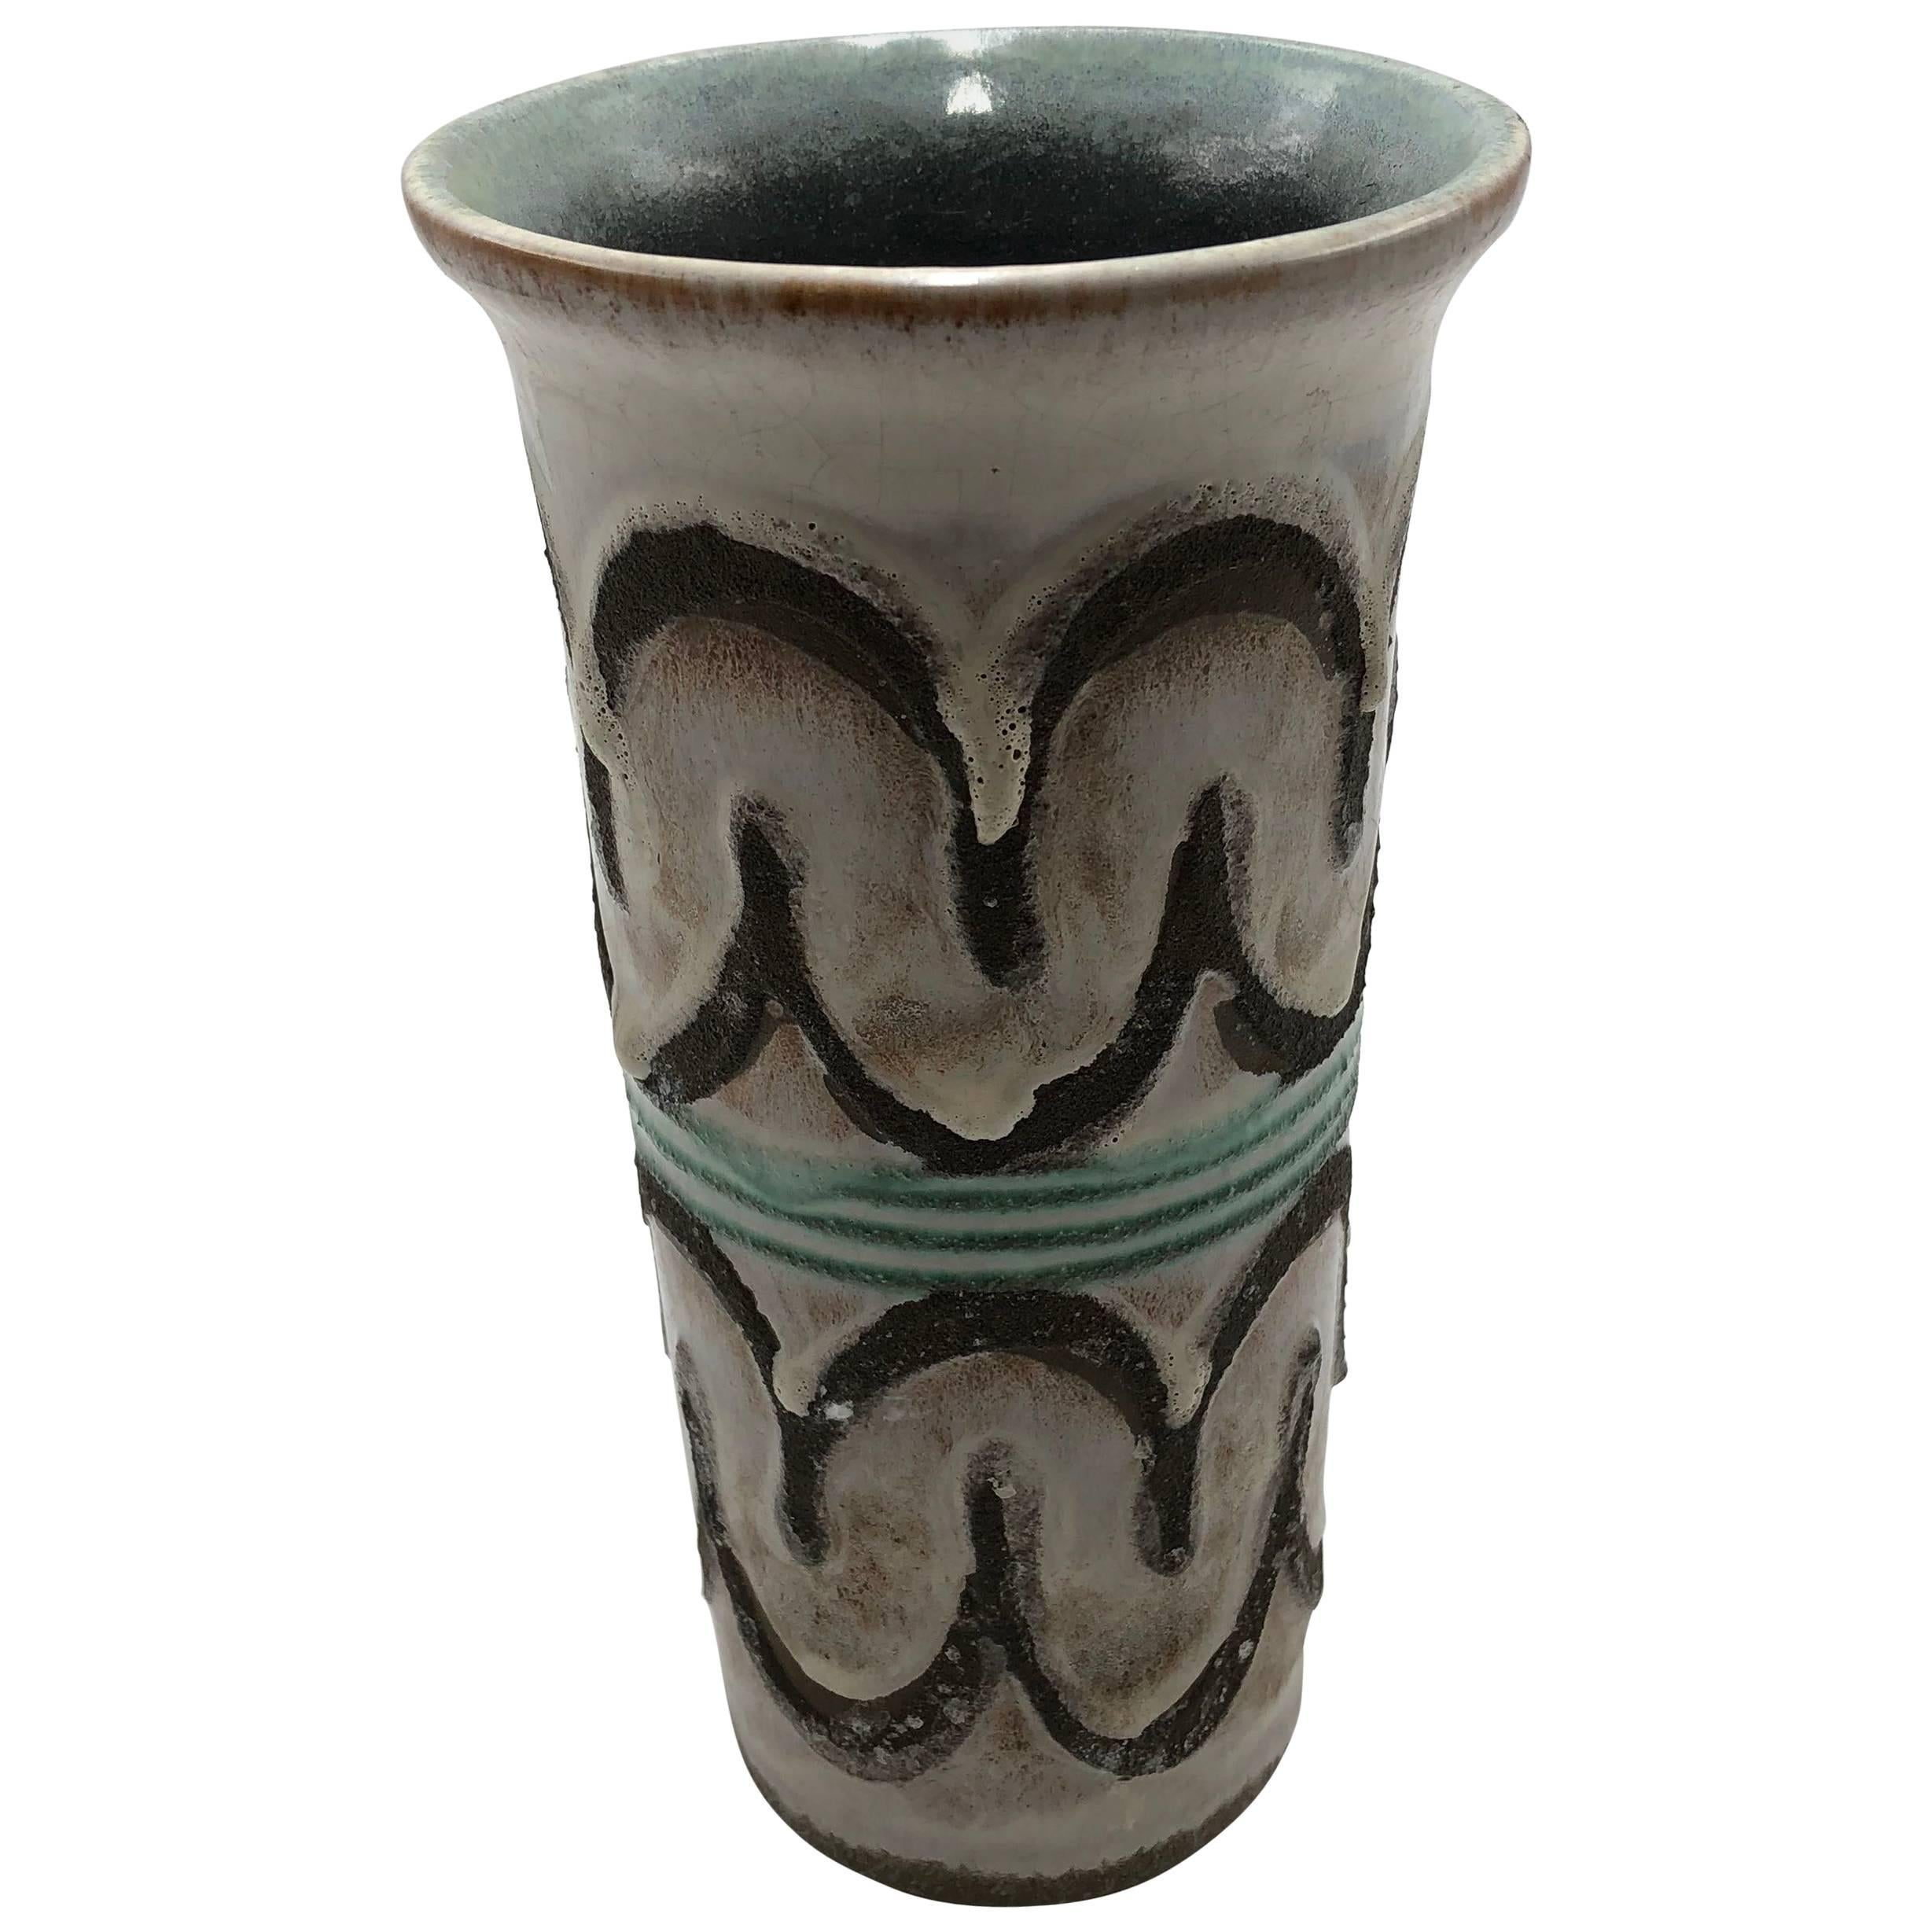 1960s Strehla West Germany Vase